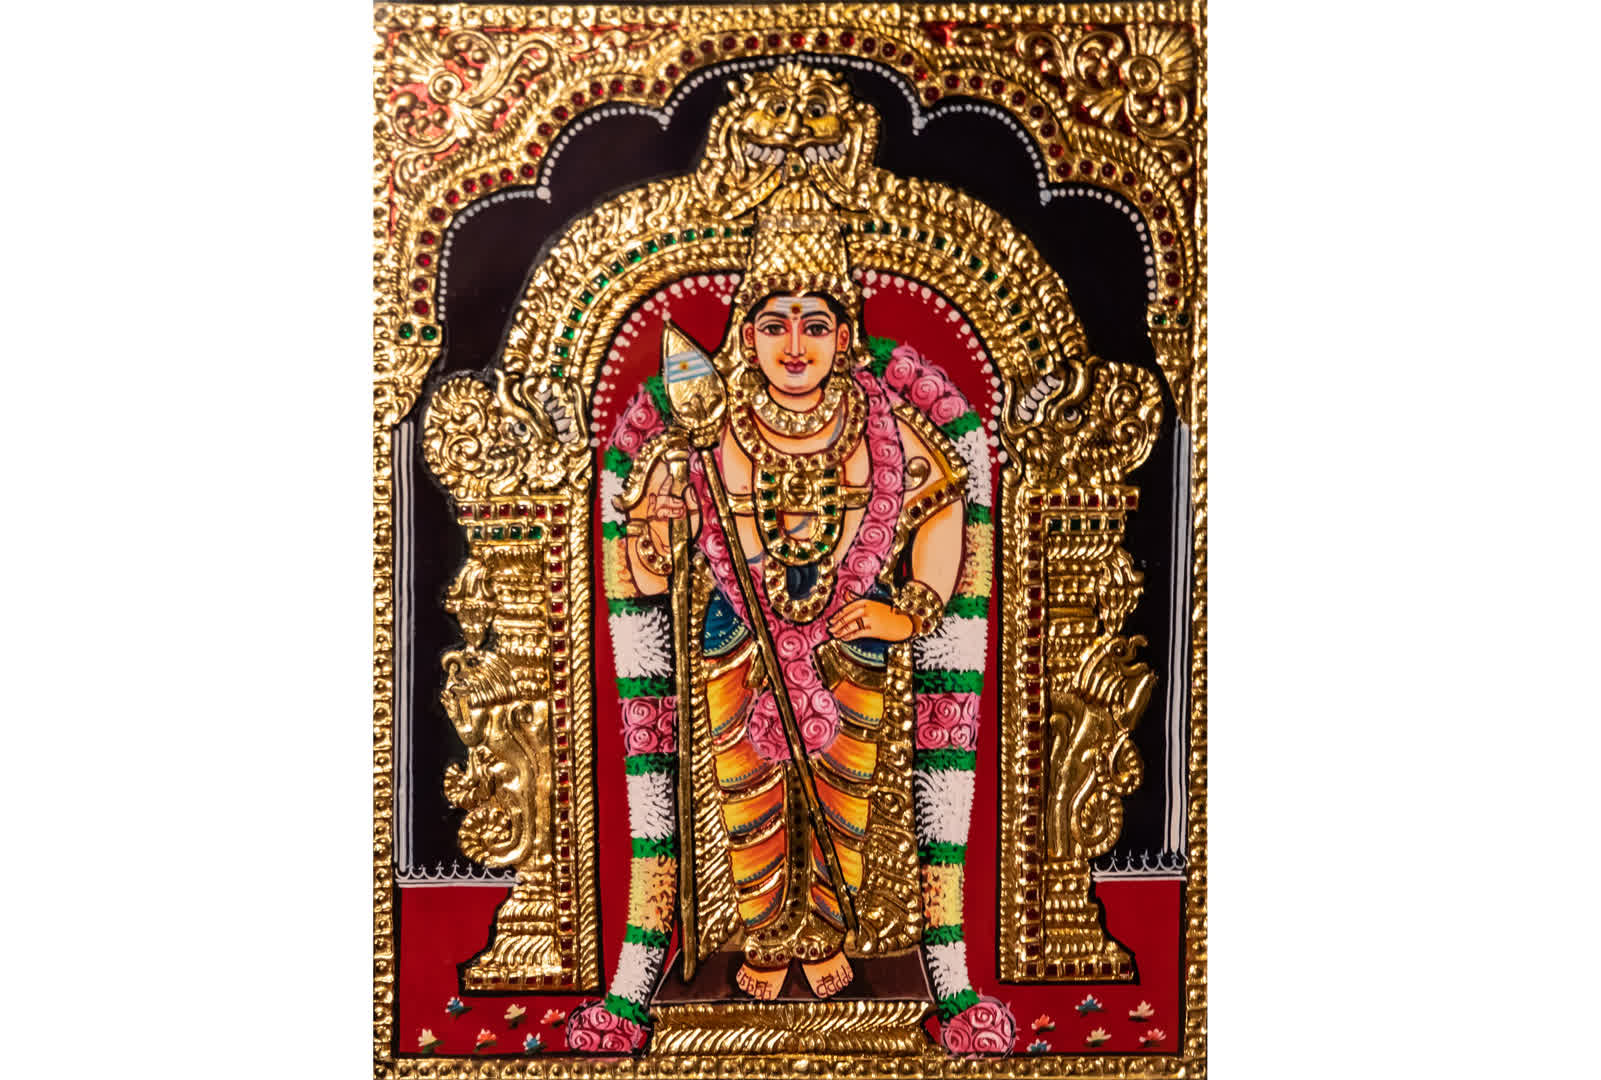 A Tanjore Painting dedicated to Kartikeya | Peepul Tree